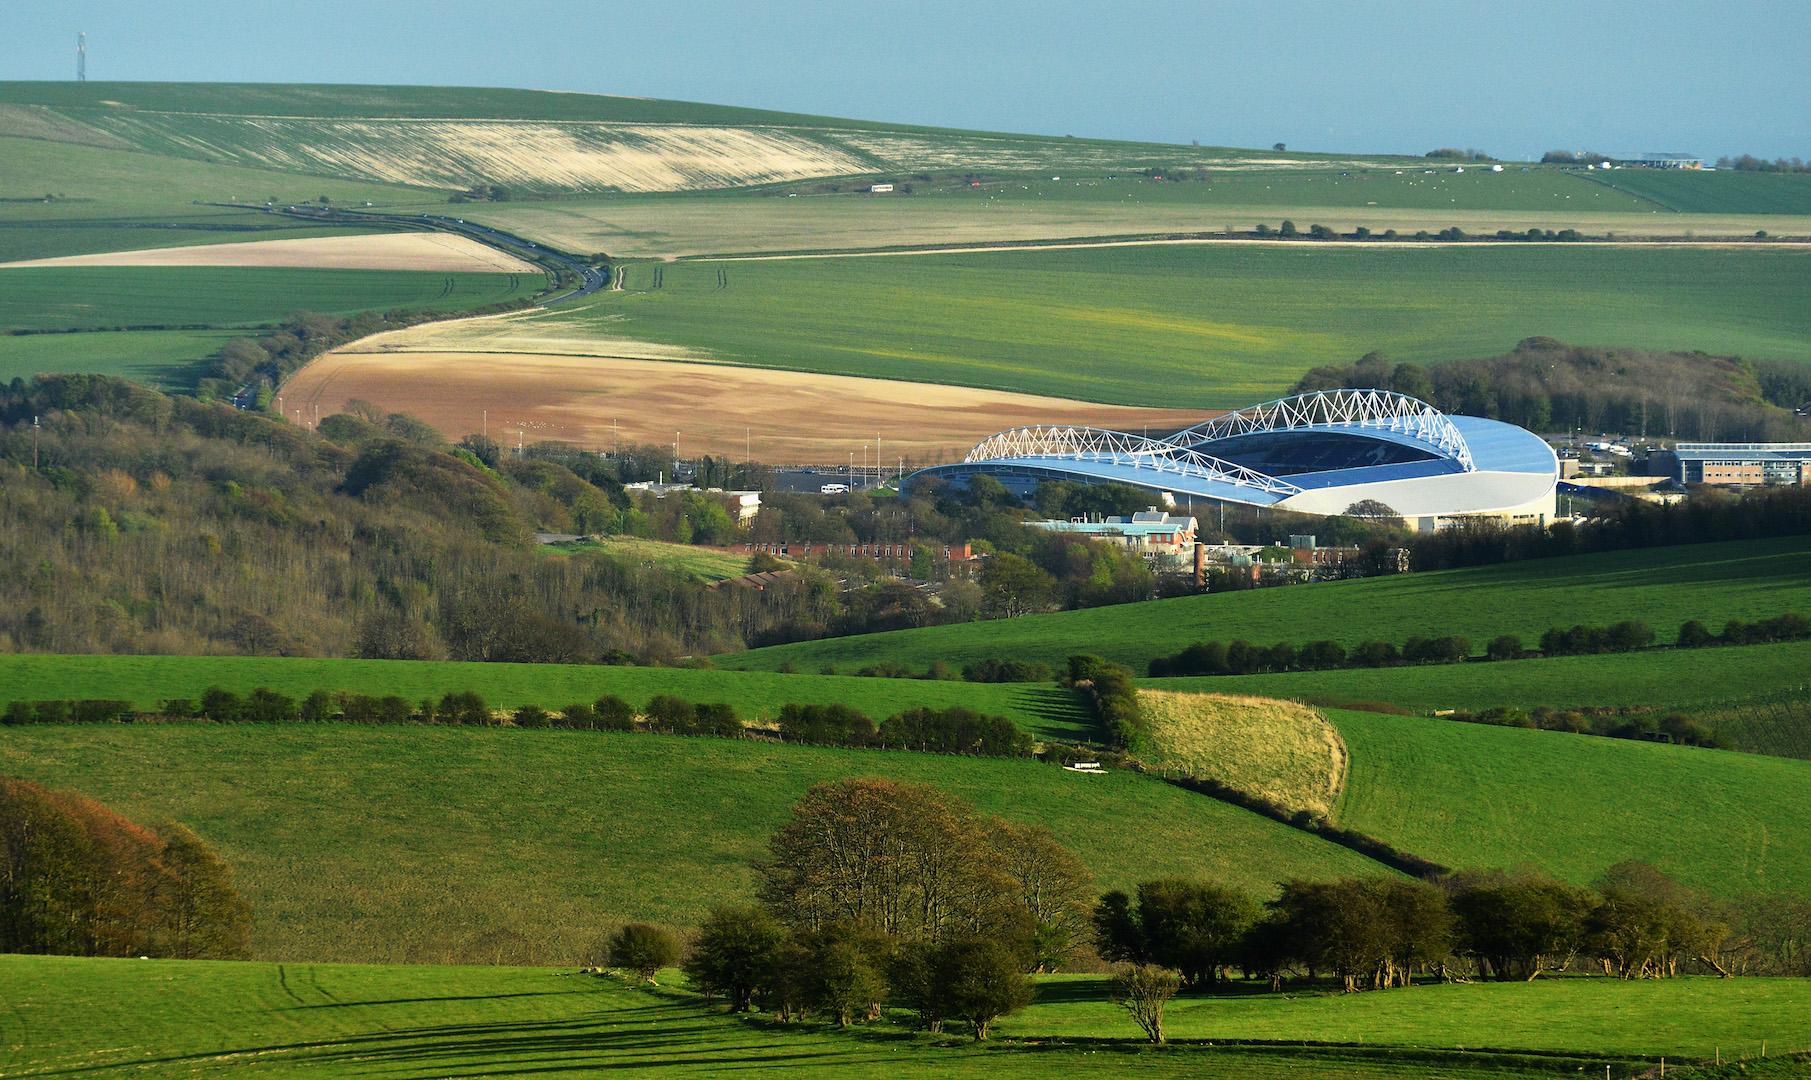 General Views Of Amex Stadium, home To Brighton & Hove Albion at Amex Stadium on April 22, 2013 in Brighton, England.